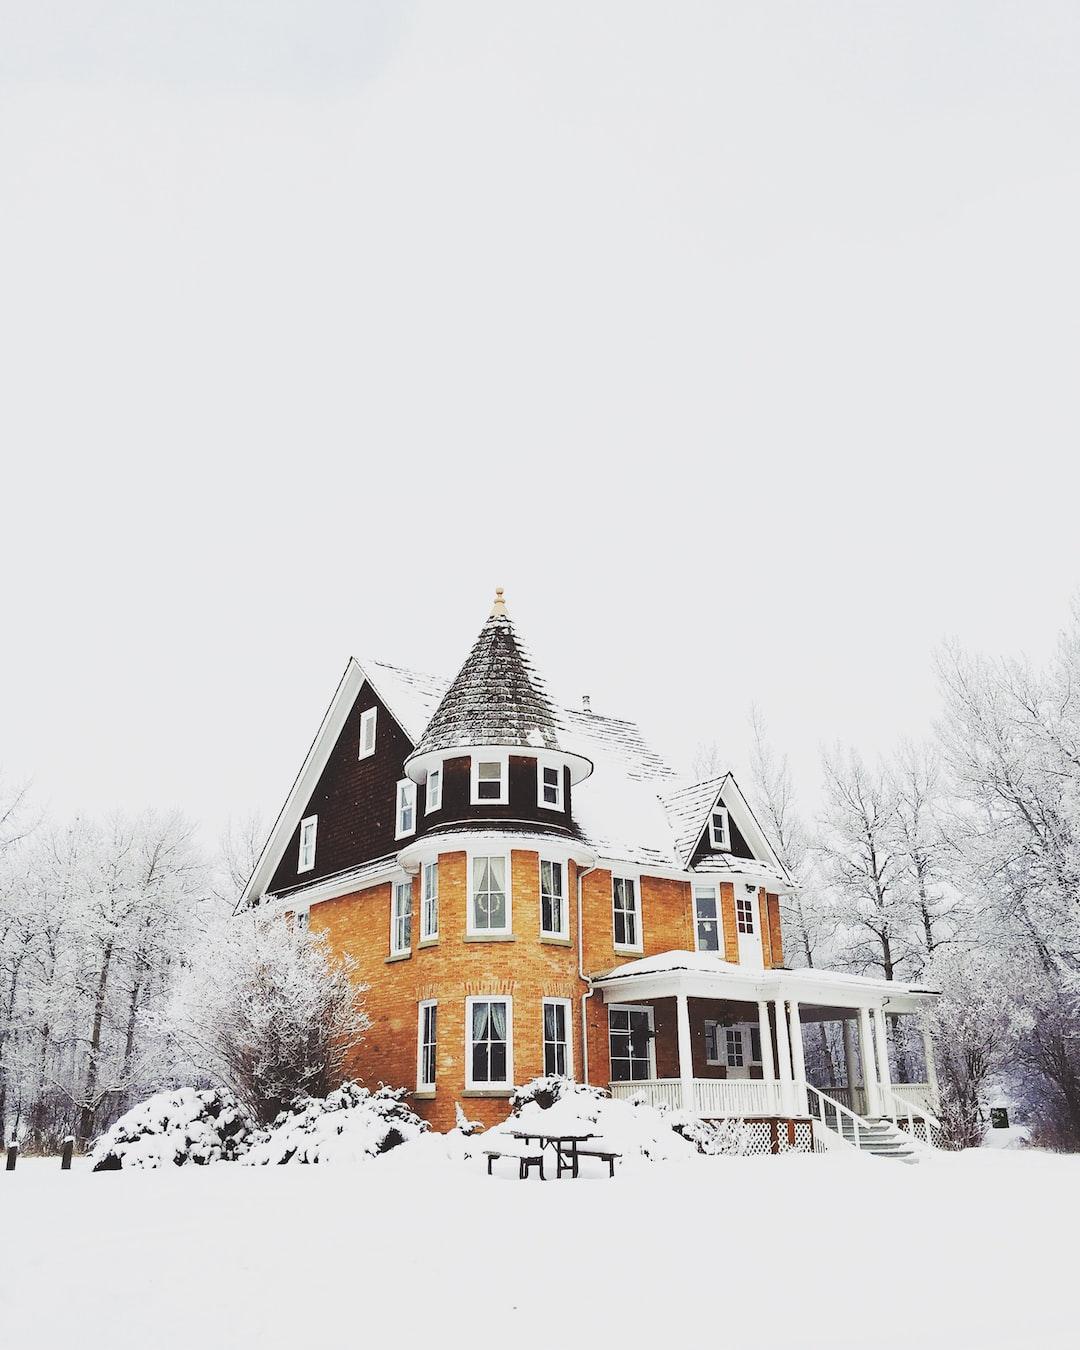 Elegant house under snow